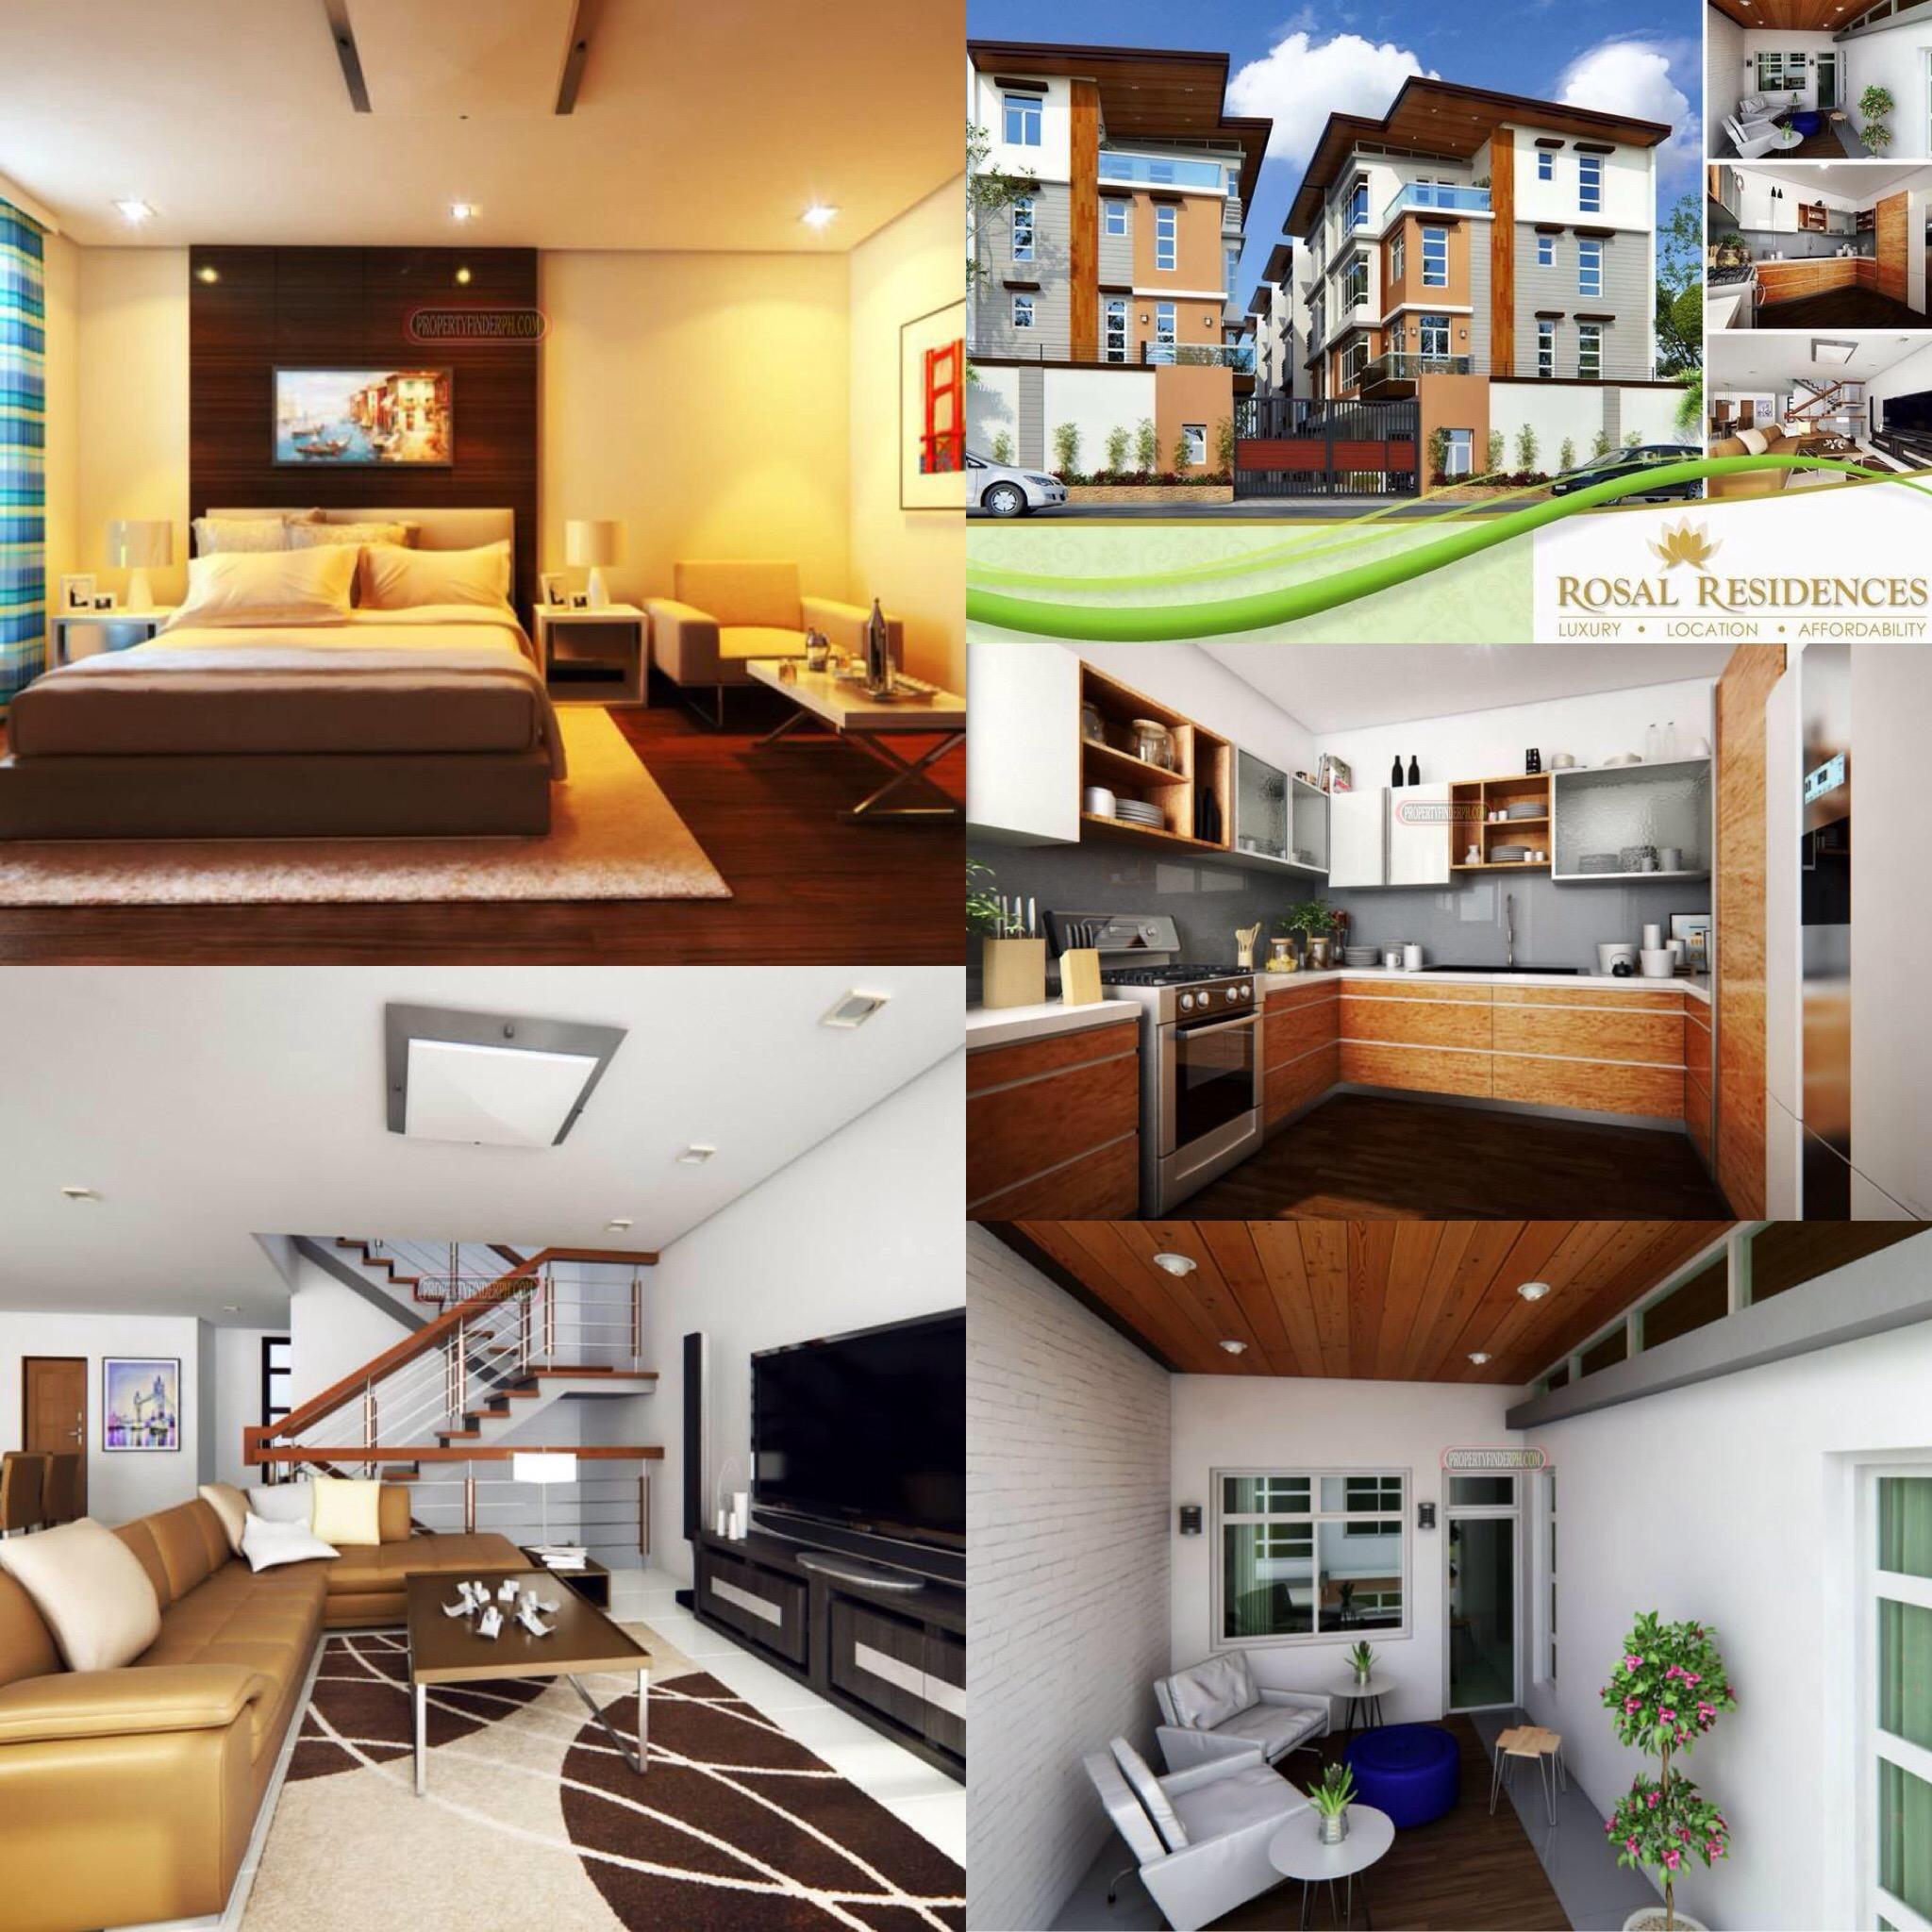 new manila quezon city house for sale 09235564517 rico navarro